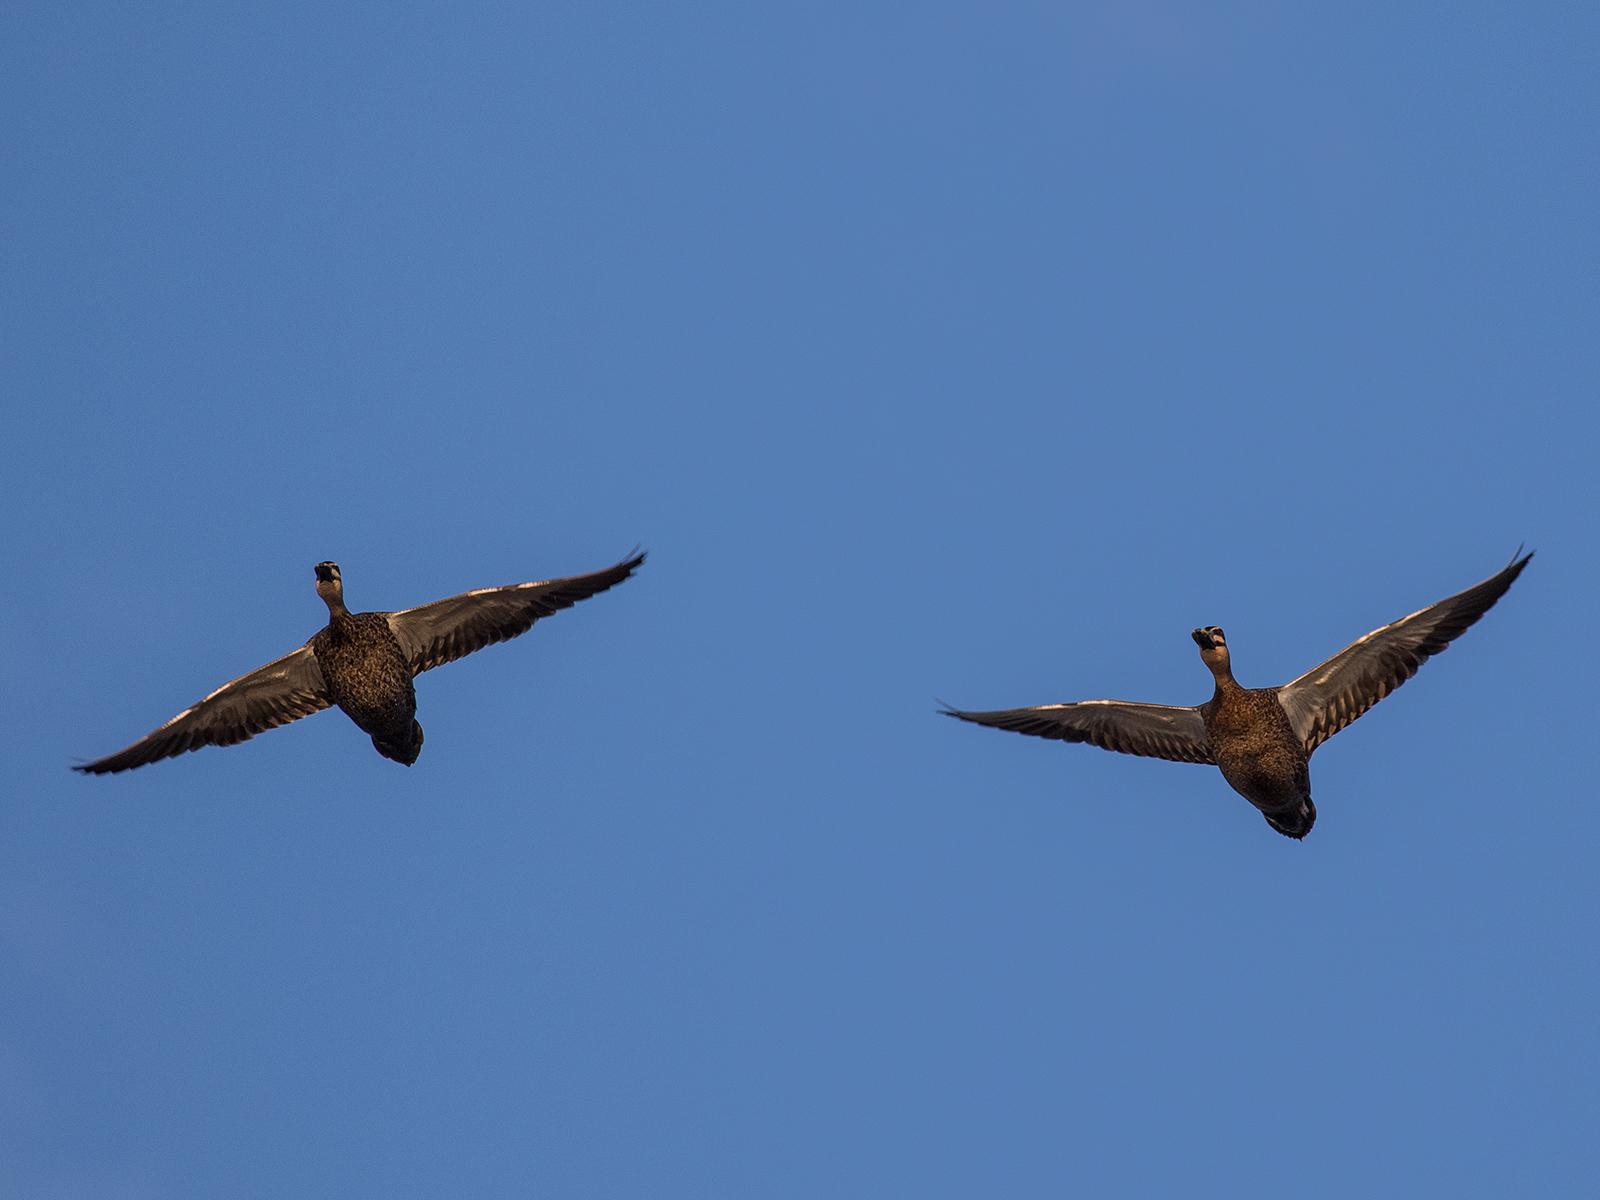 Bird Flight Patterns Awesome Inspiration